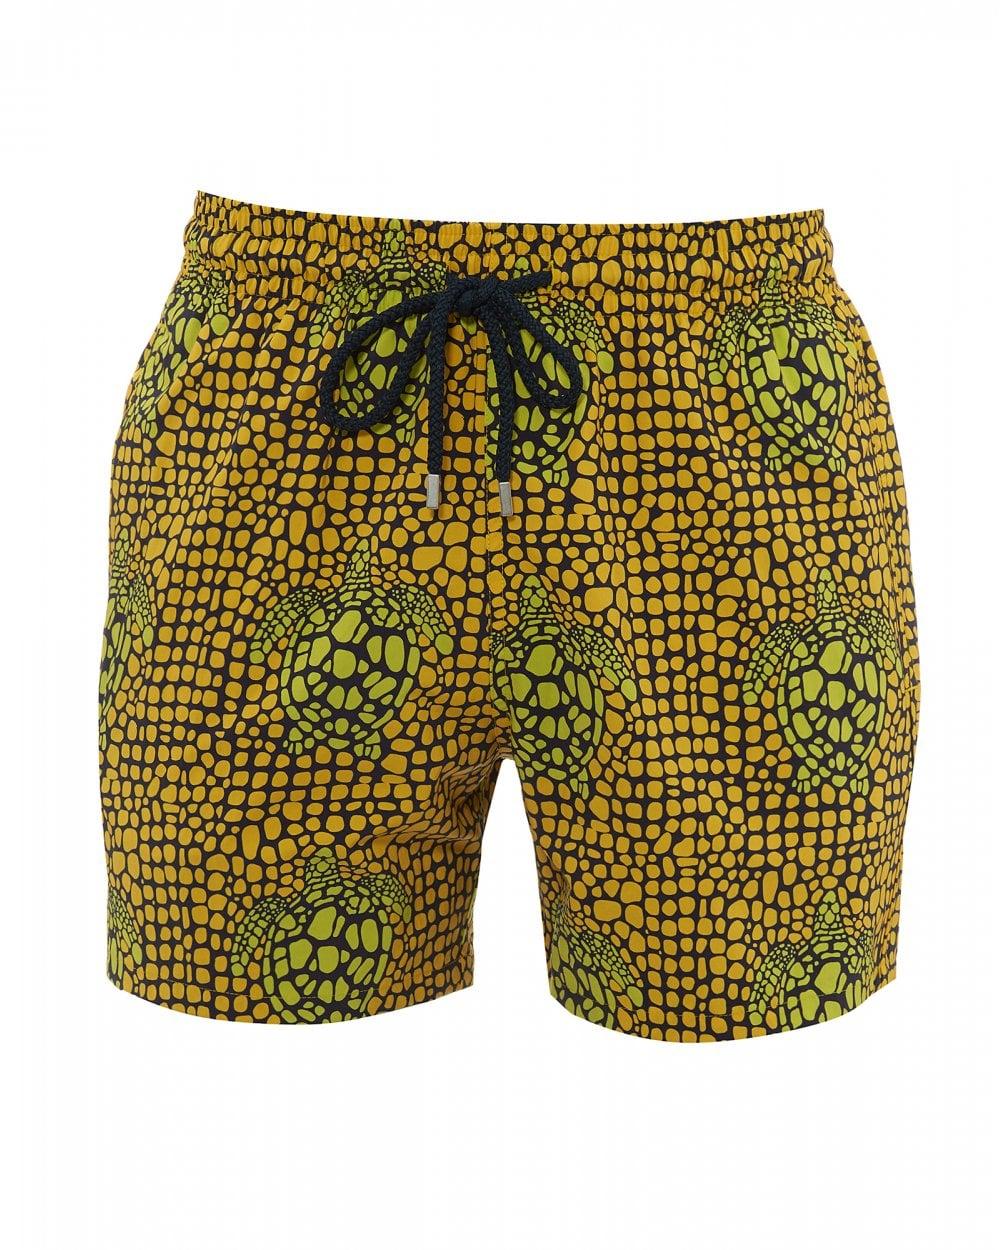 7e89e777b9 Mens Moorise Shell Turtles Swimshorts, Yellow Stretch Swimming Trunks